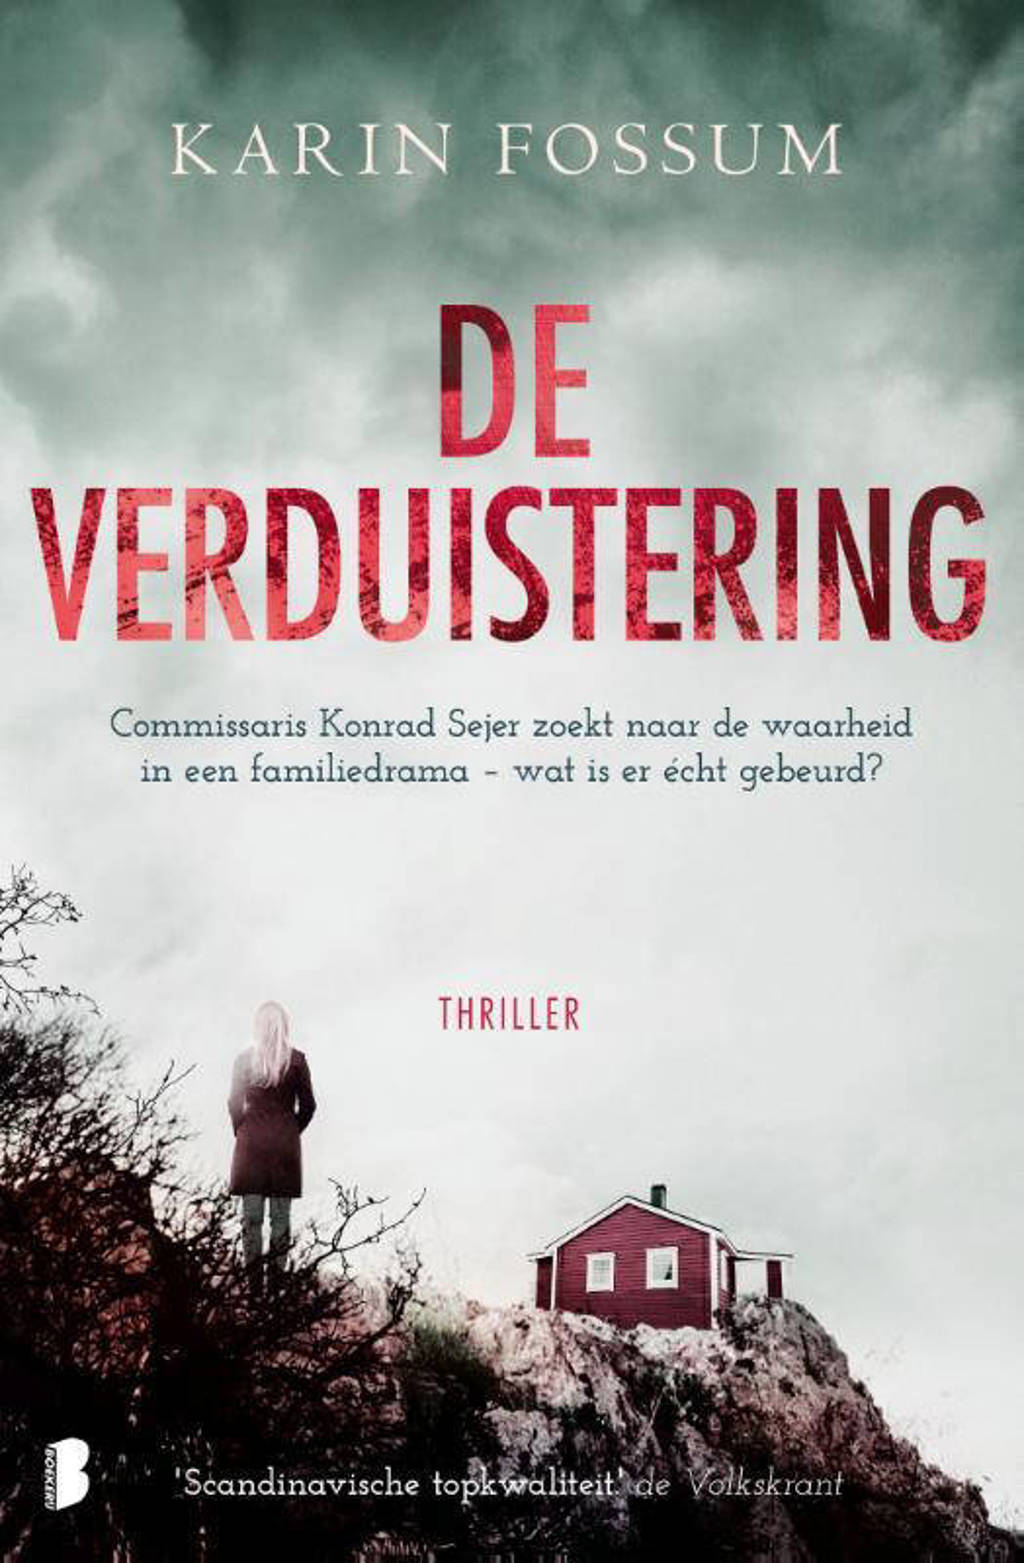 Konrad Sejer: De verduistering - Karin Fossum